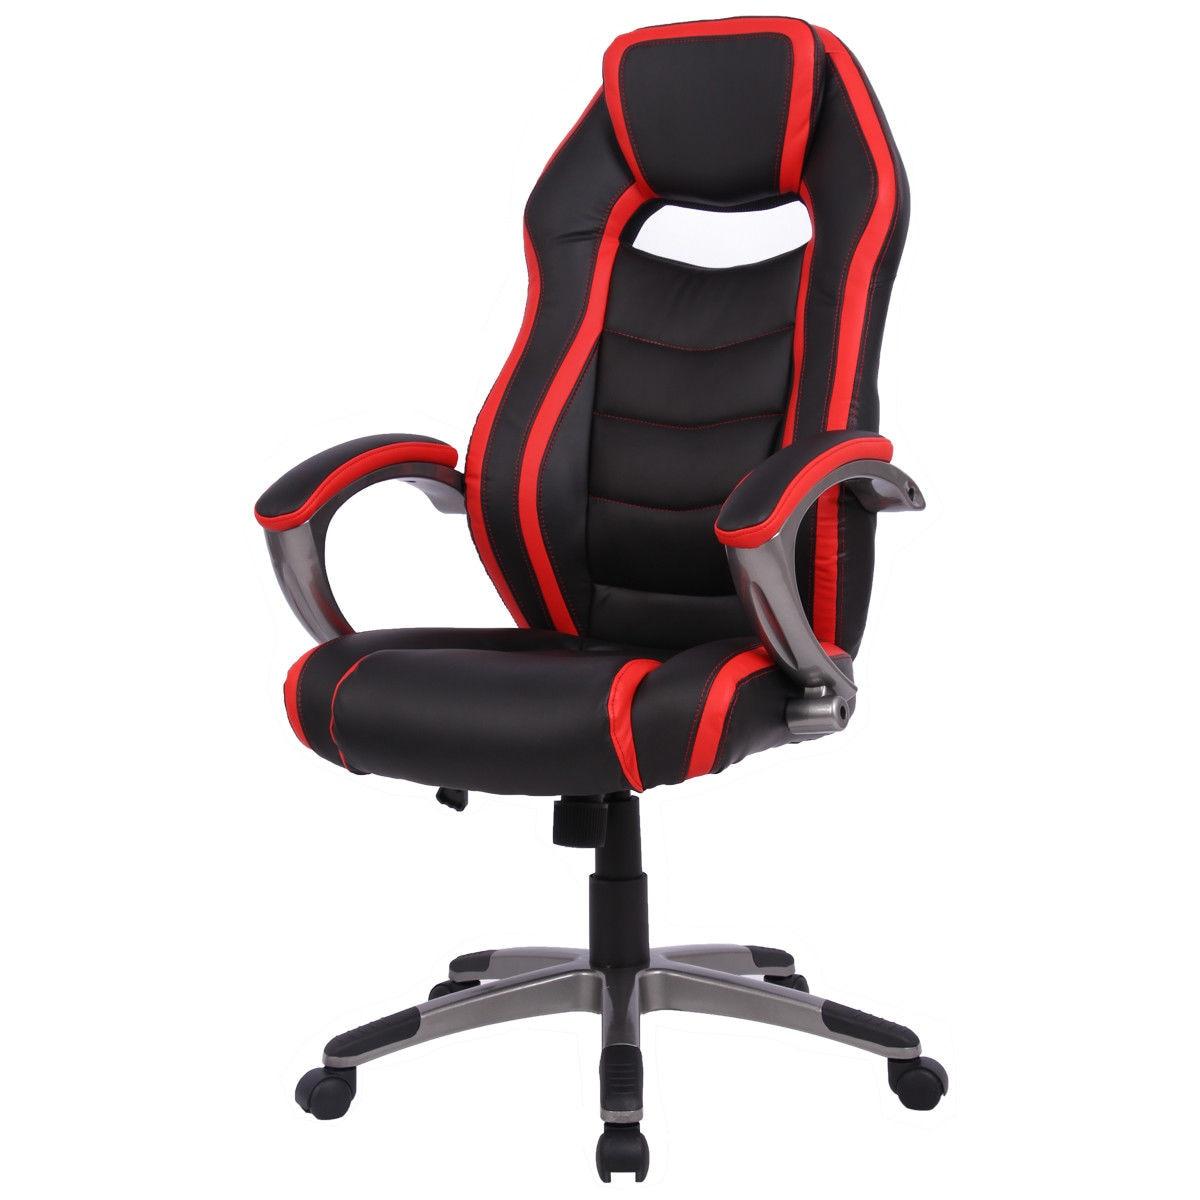 Giantex Racing Car Style High Back Office Computer Chair